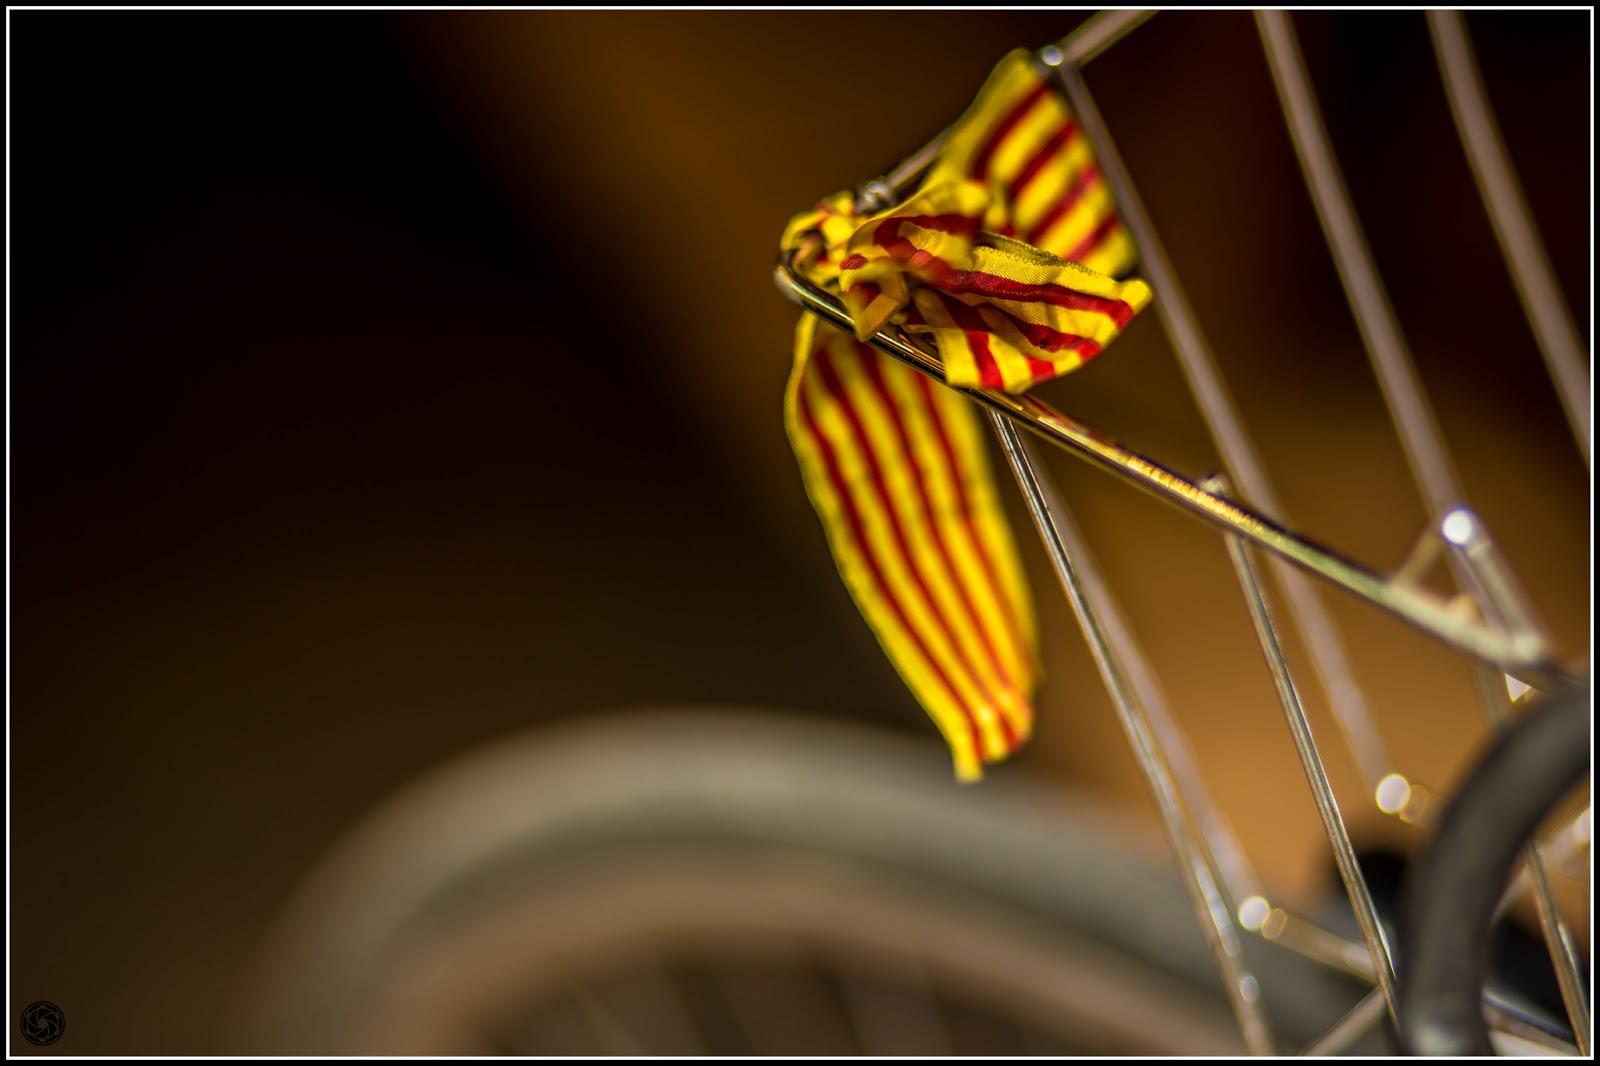 Bicicleta reivindicativa: Canon EOS 5D Mark III | ISO400 | Canon 85mm | f/1.8 | 1/320s